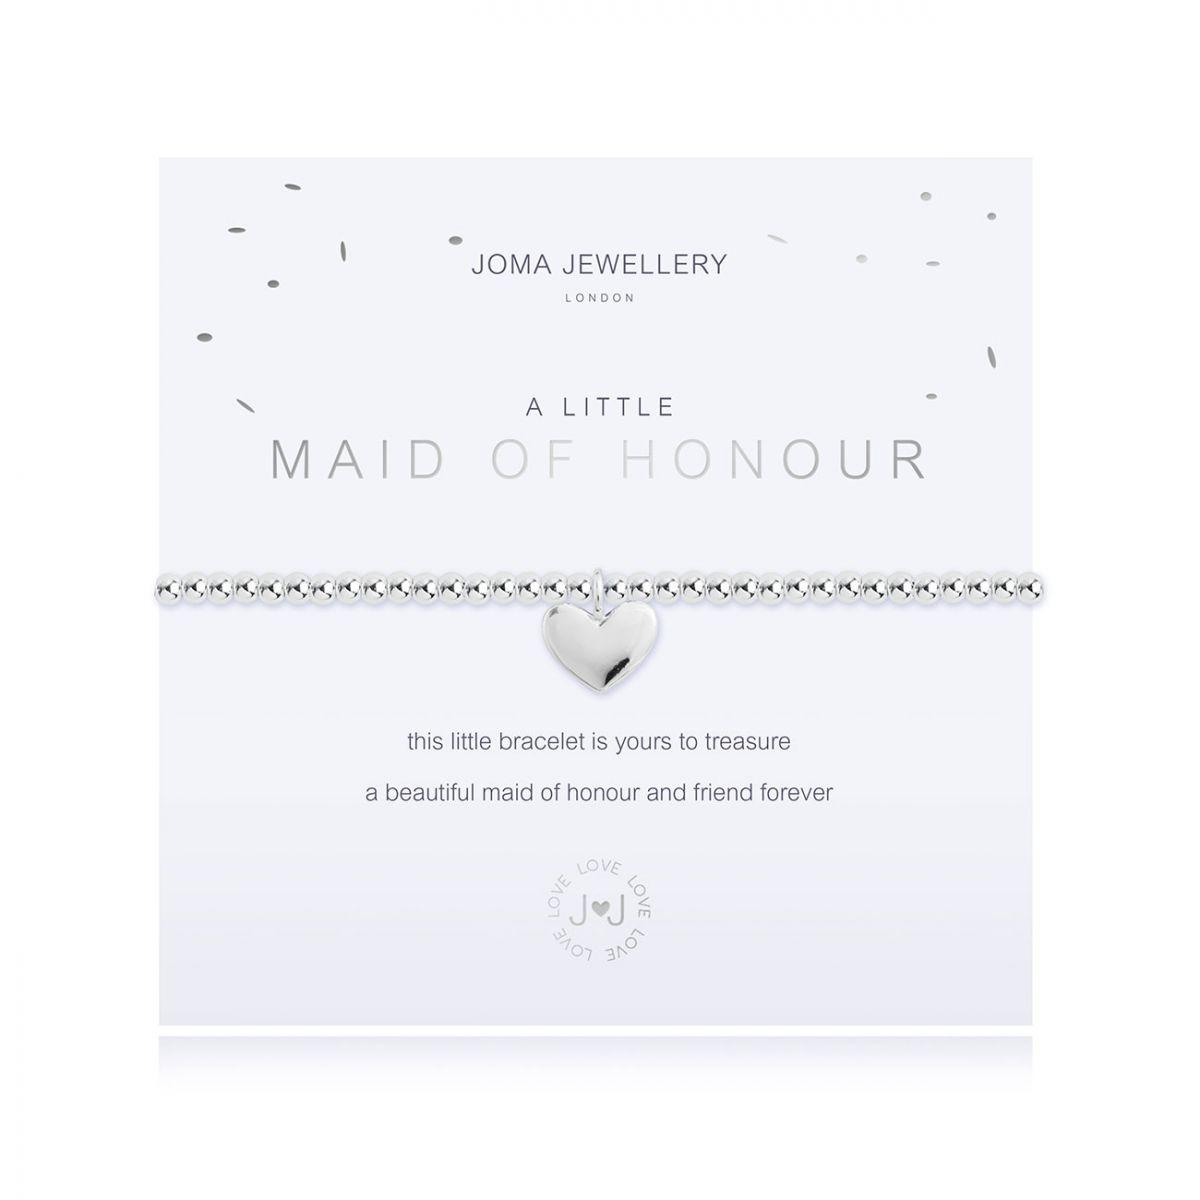 Joma Jewellery A Little 'Maid of Honour' Bracelet